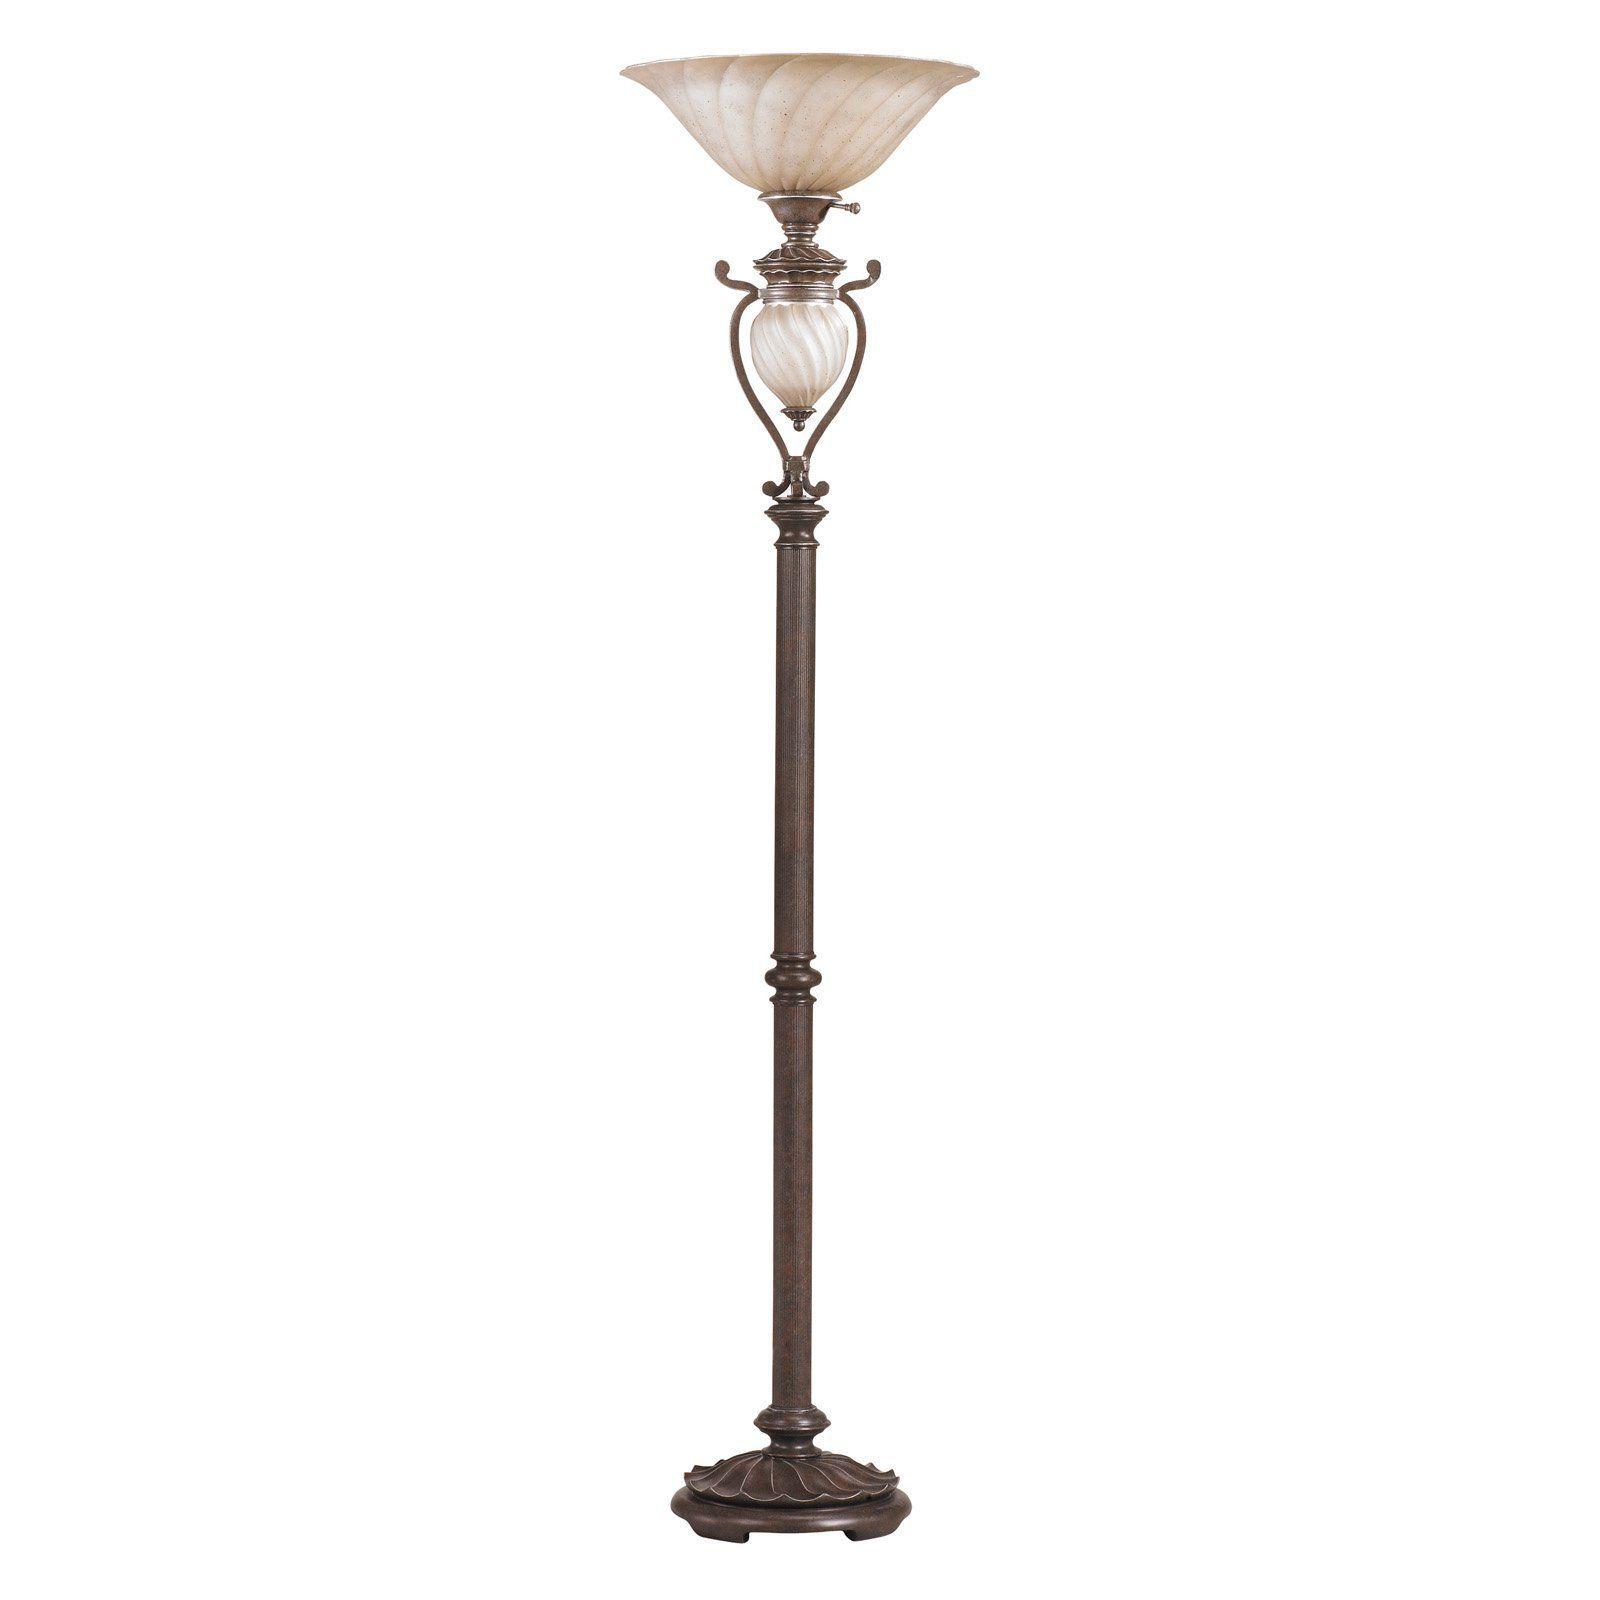 Signature Design by Ashley L531911 Gavivi Floor Lamp